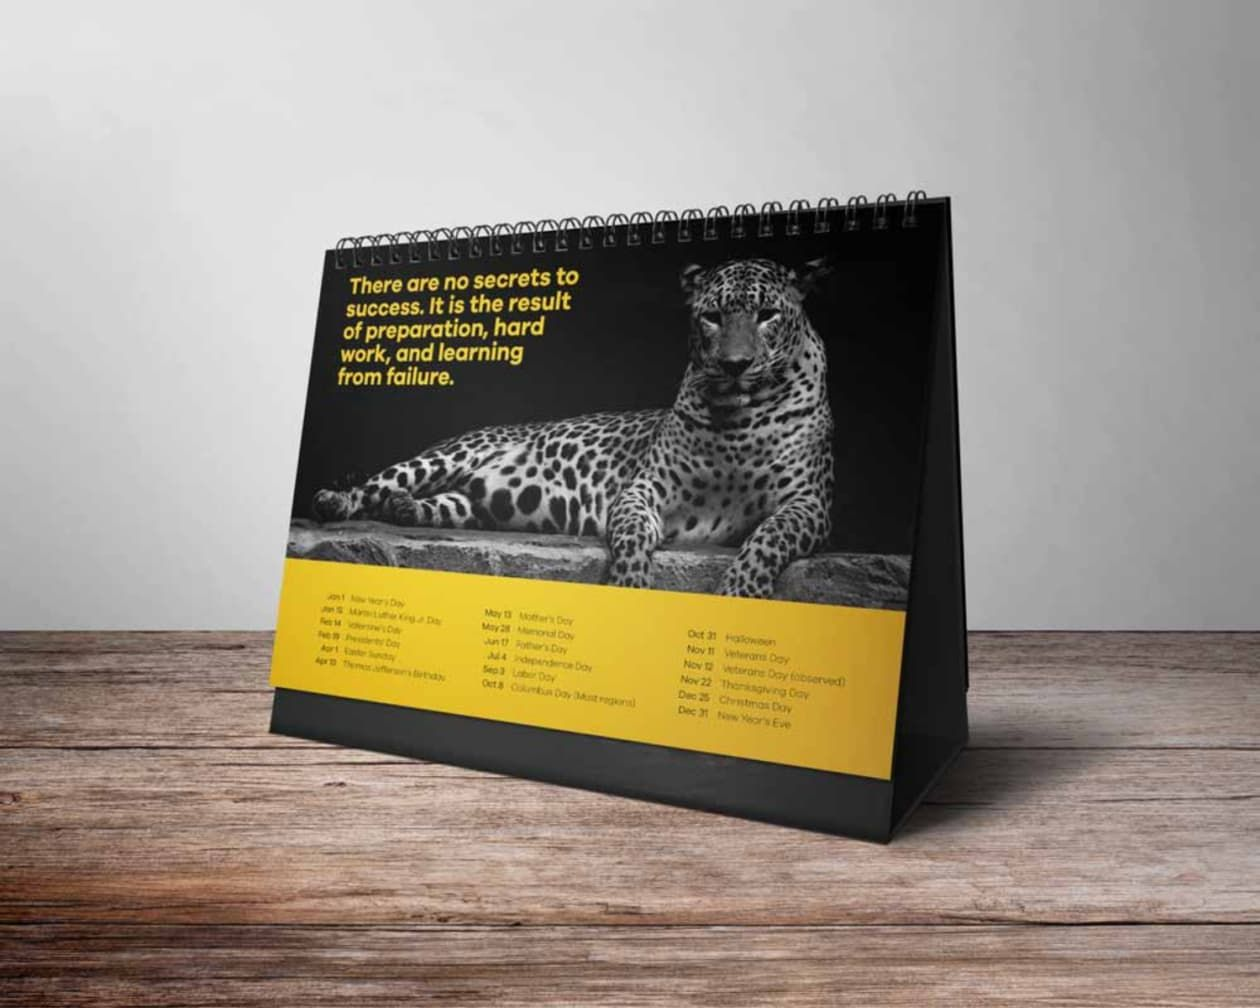 inspiredesign19 I will design creative desk calendar